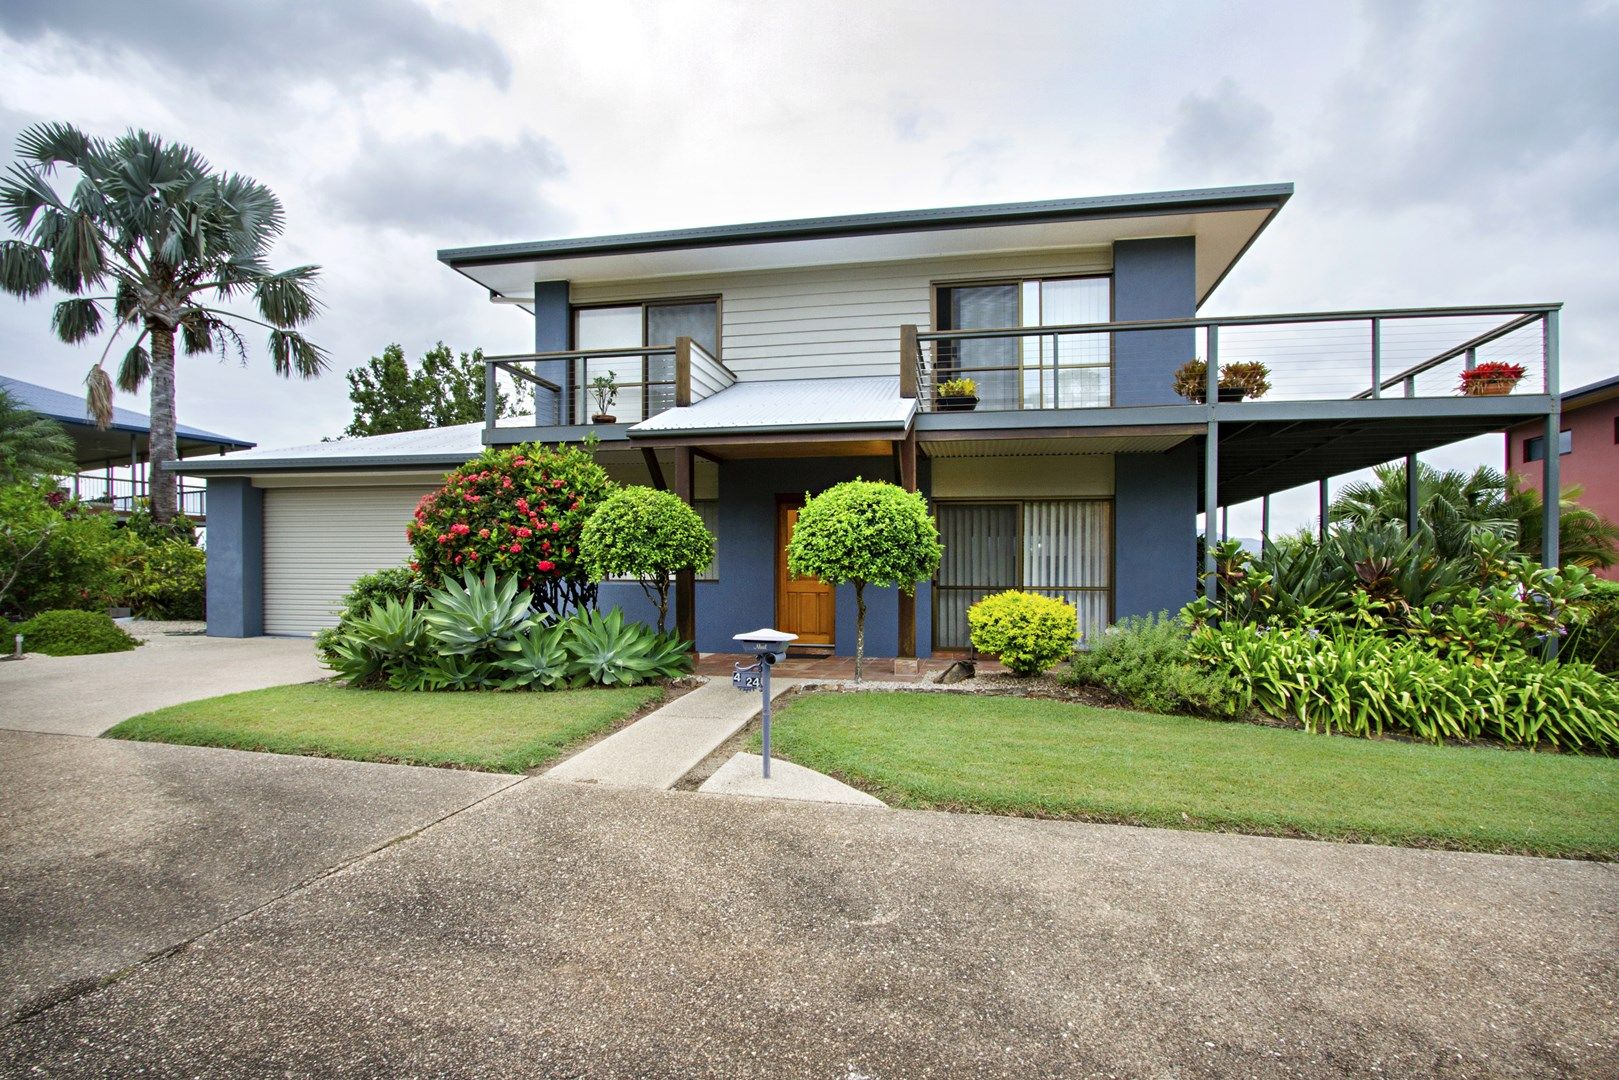 4/24 Illawong Street, Cannonvale QLD 4802, Image 0